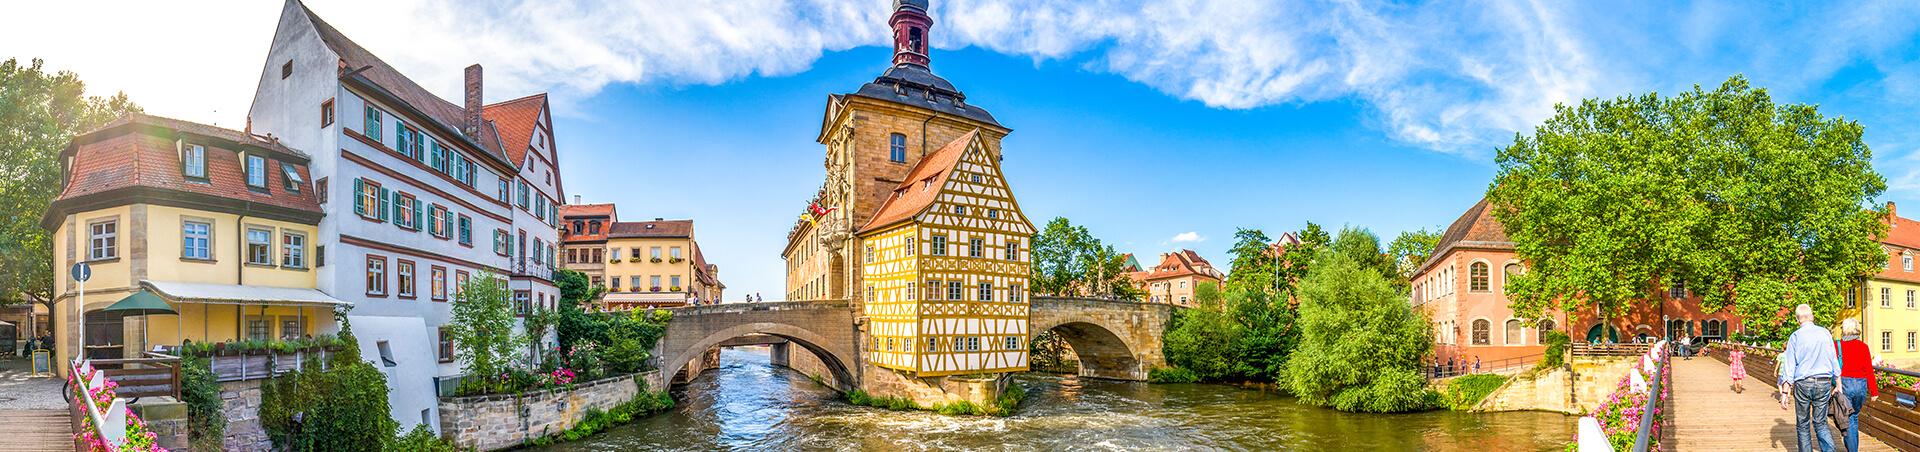 River Princess Exterior Regensburg